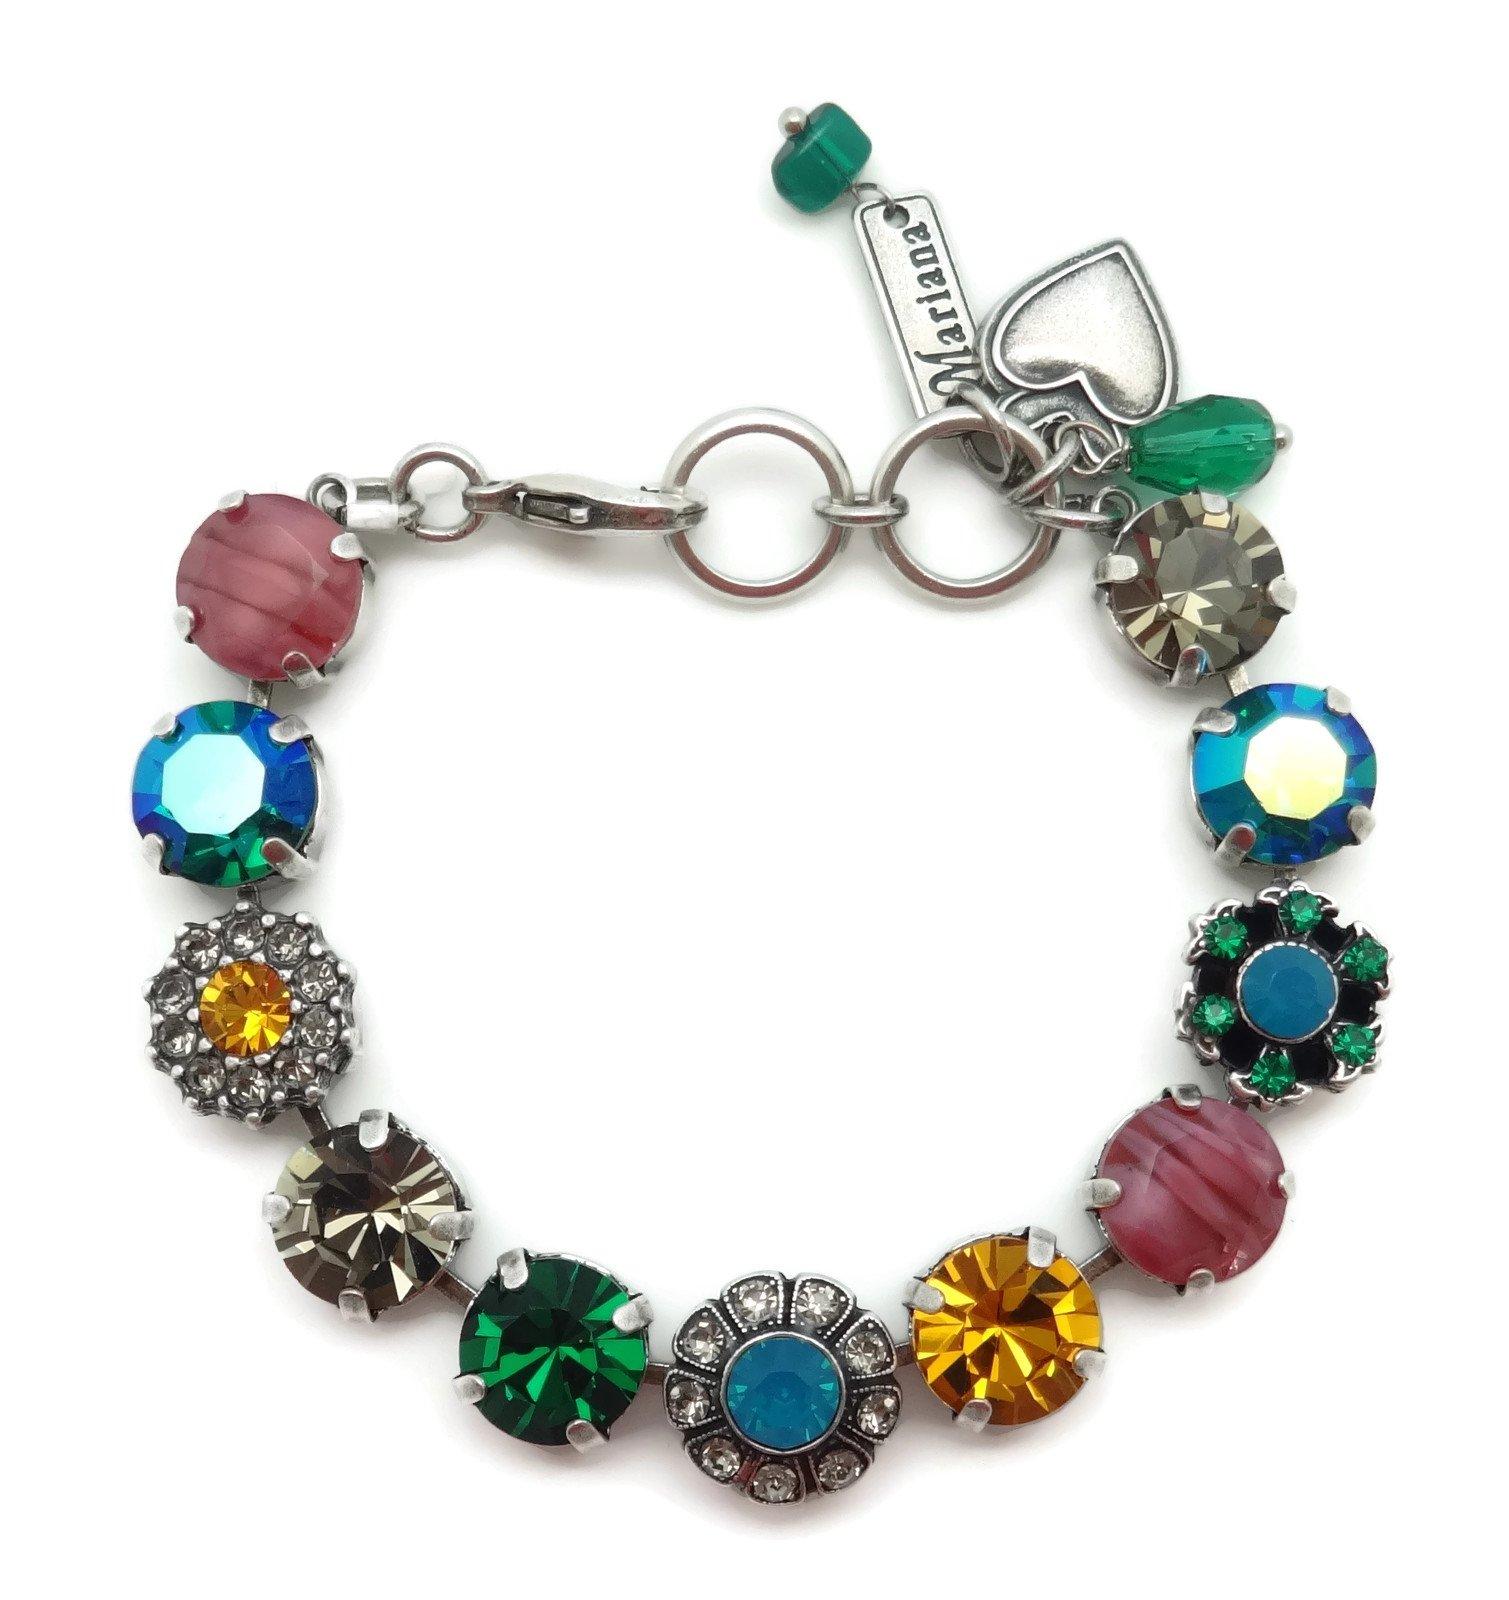 Mariana Silver Plated Swarovski Crystal Bracelet Multi Color Mosaic Design 1086 Odyssey Selene